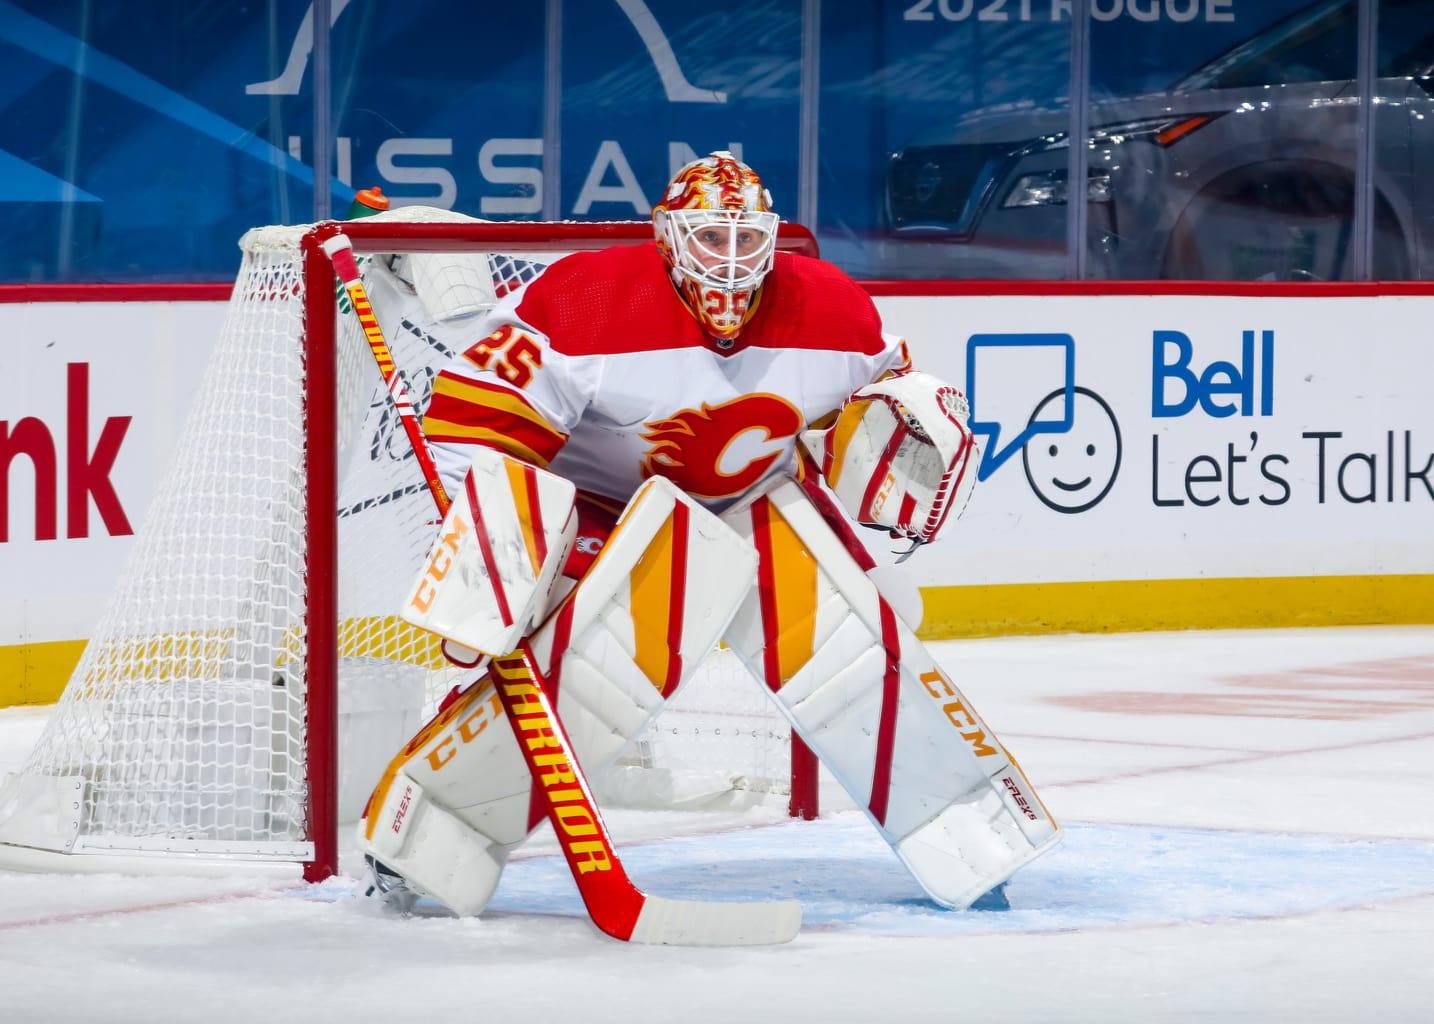 Calgary Flames 2021 Report Cards: Jacob Markstrom